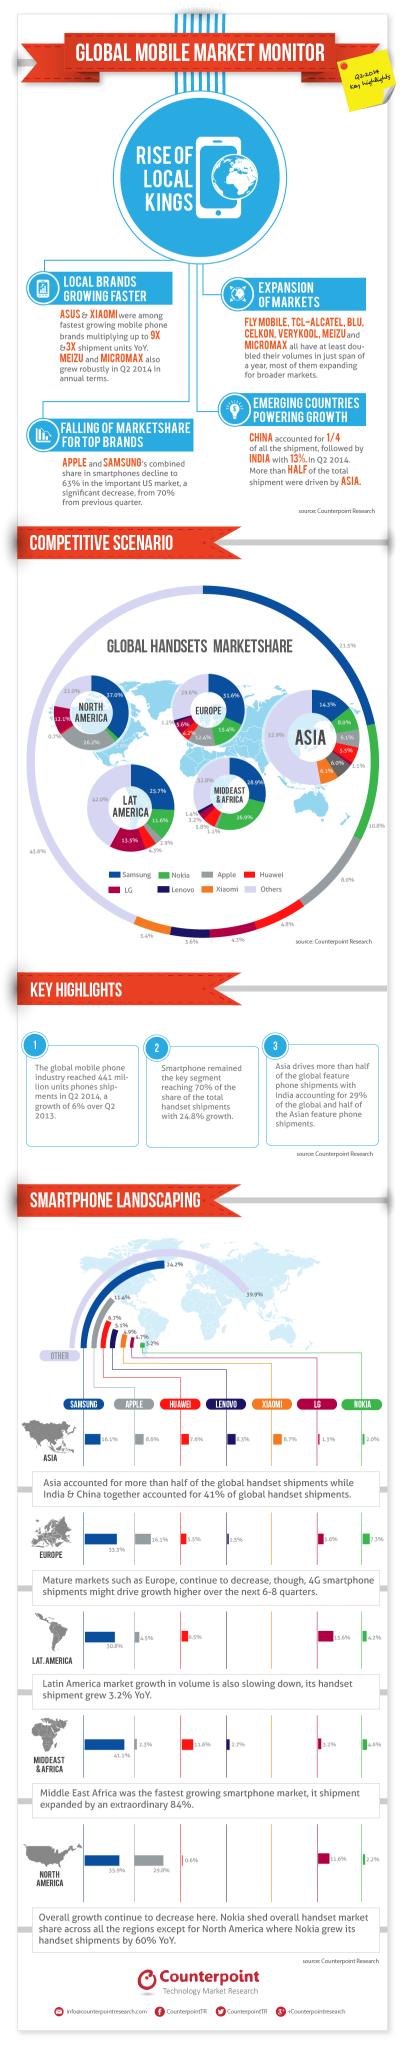 Q2-2014-Global Mobile Market Monitor V4